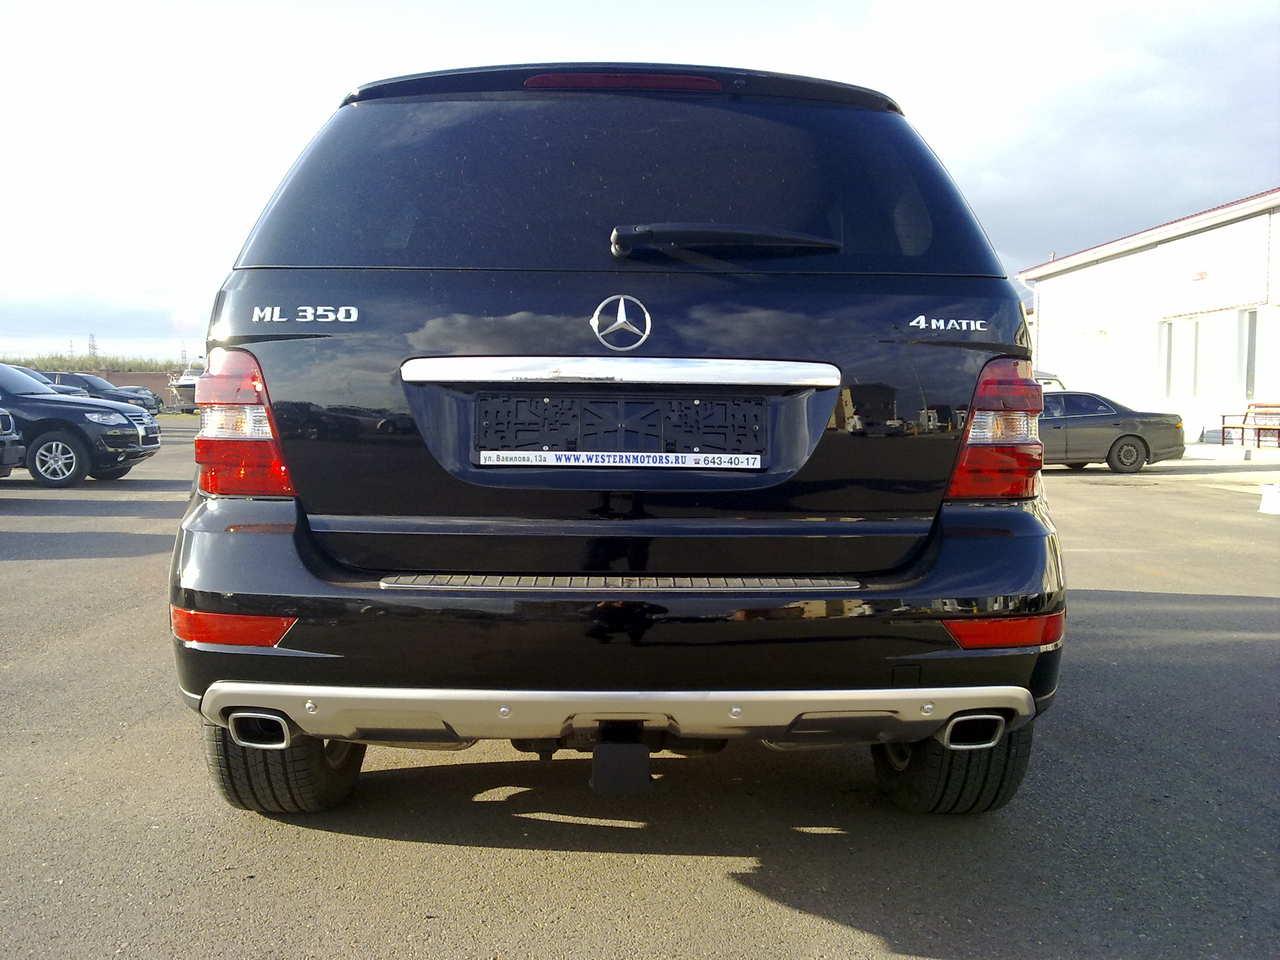 2008 mercedes benz ml class for sale 3500cc gasoline for Mercedes benz ml 2008 for sale